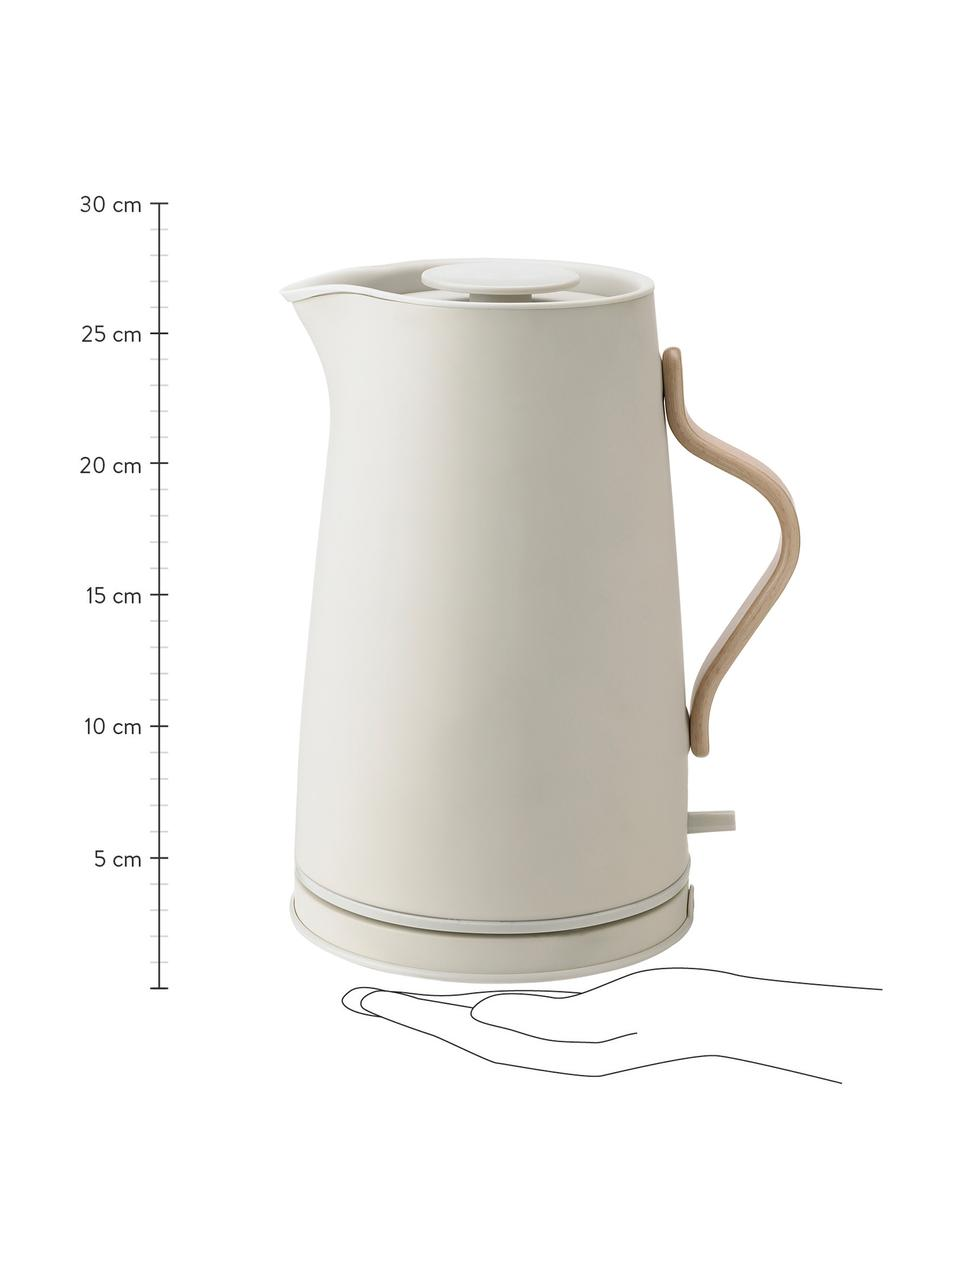 Wasserkocher Emma in Beige/matt, 1.2 L, Korpus: Edelstahl, beschichtet, Griff: Buchenholz, Beige, 1.2 L